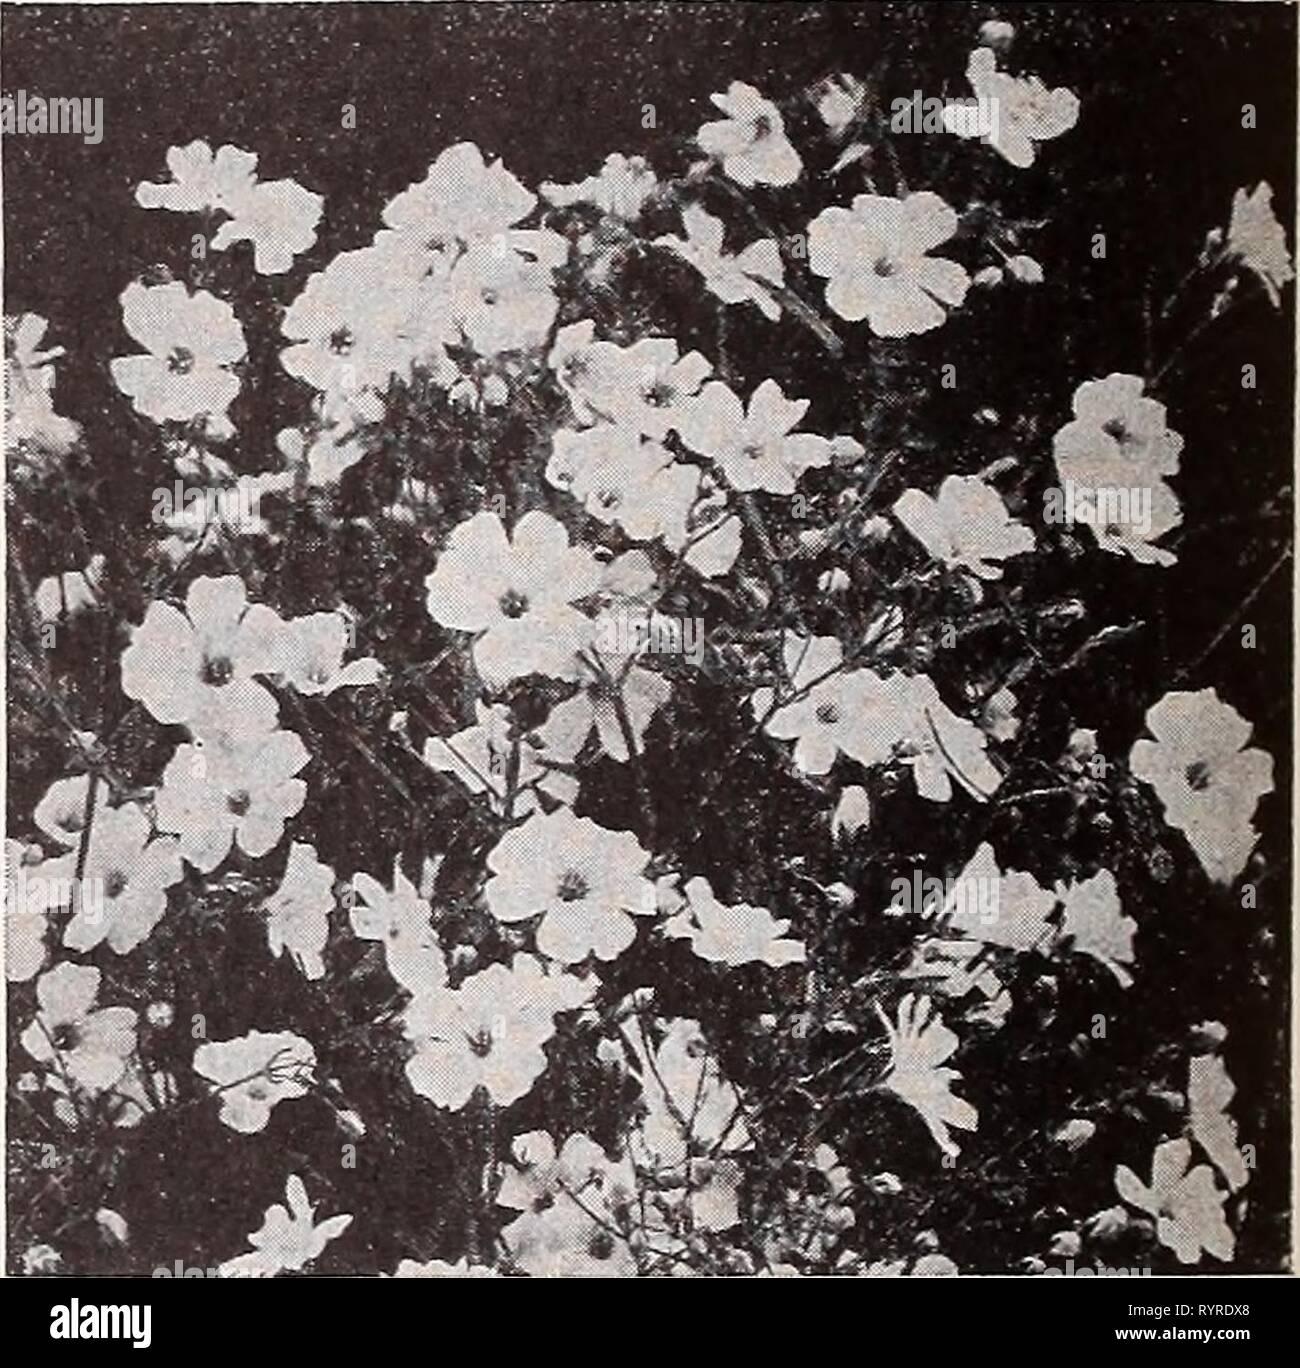 Dreer's wholesale catalog for florists Dreer's wholesale catalog for florists and market gardeners : 1939 winter spring summer . dreerswholesalec1939henr Year: 1939  HENRY A. DREER Annual Flower Seeds WHOLESALE CATALOG Dracaena Indlvisa. The popular center plant for vases, etc. Long, narrow, graceful foliage. Tr. pkt. 15c; oz. 40c; Yi lb. $1.25. Echinocystis Lobata (Wild Cucumber Vine). A quick-growing annual climber. Oz. 15c; Yi lb. 50c. Eschscholtzia—California Poppy Tr. pkt. Oz. Aurantiaca. Golden orange. Very rlch..$0 10 $0 25 Chrome Queen. Rich chrome yellow 10 30 Crimson King. Rich carmi - Stock Image